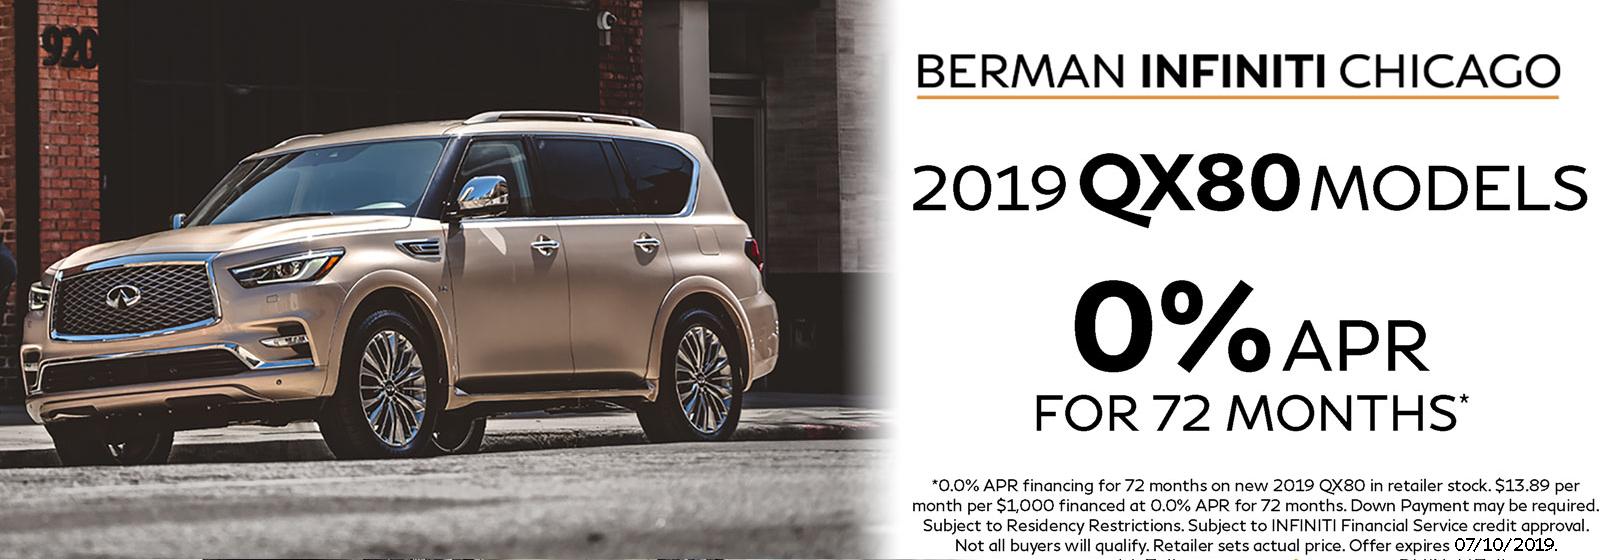 New 2019 INFINITI QX80 July offer at Berman INFINITI Chicago!